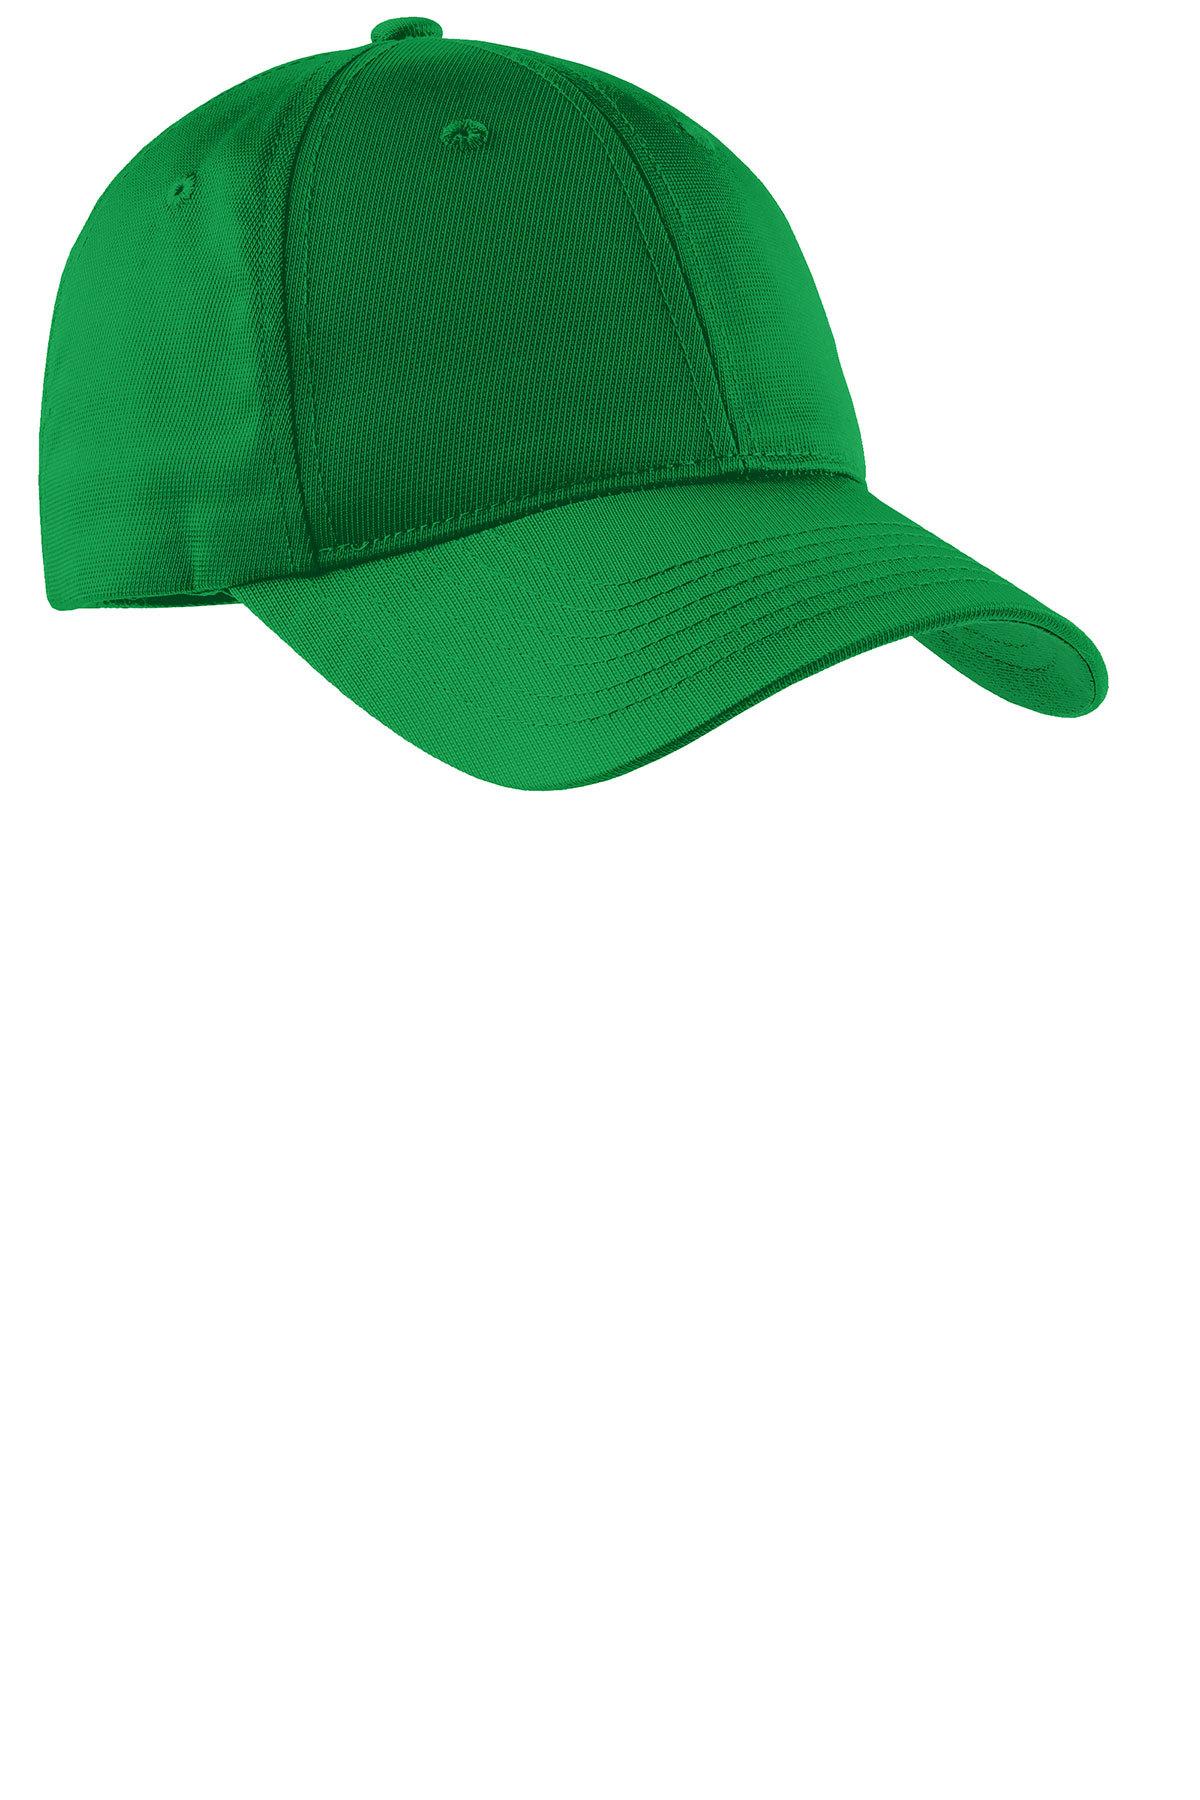 Sport Tek Dry Zone Nylon Cap Performance Team Caps Sanmar Shop for mens hats & caps in mens hats, gloves & scarves. sport tek dry zone nylon cap